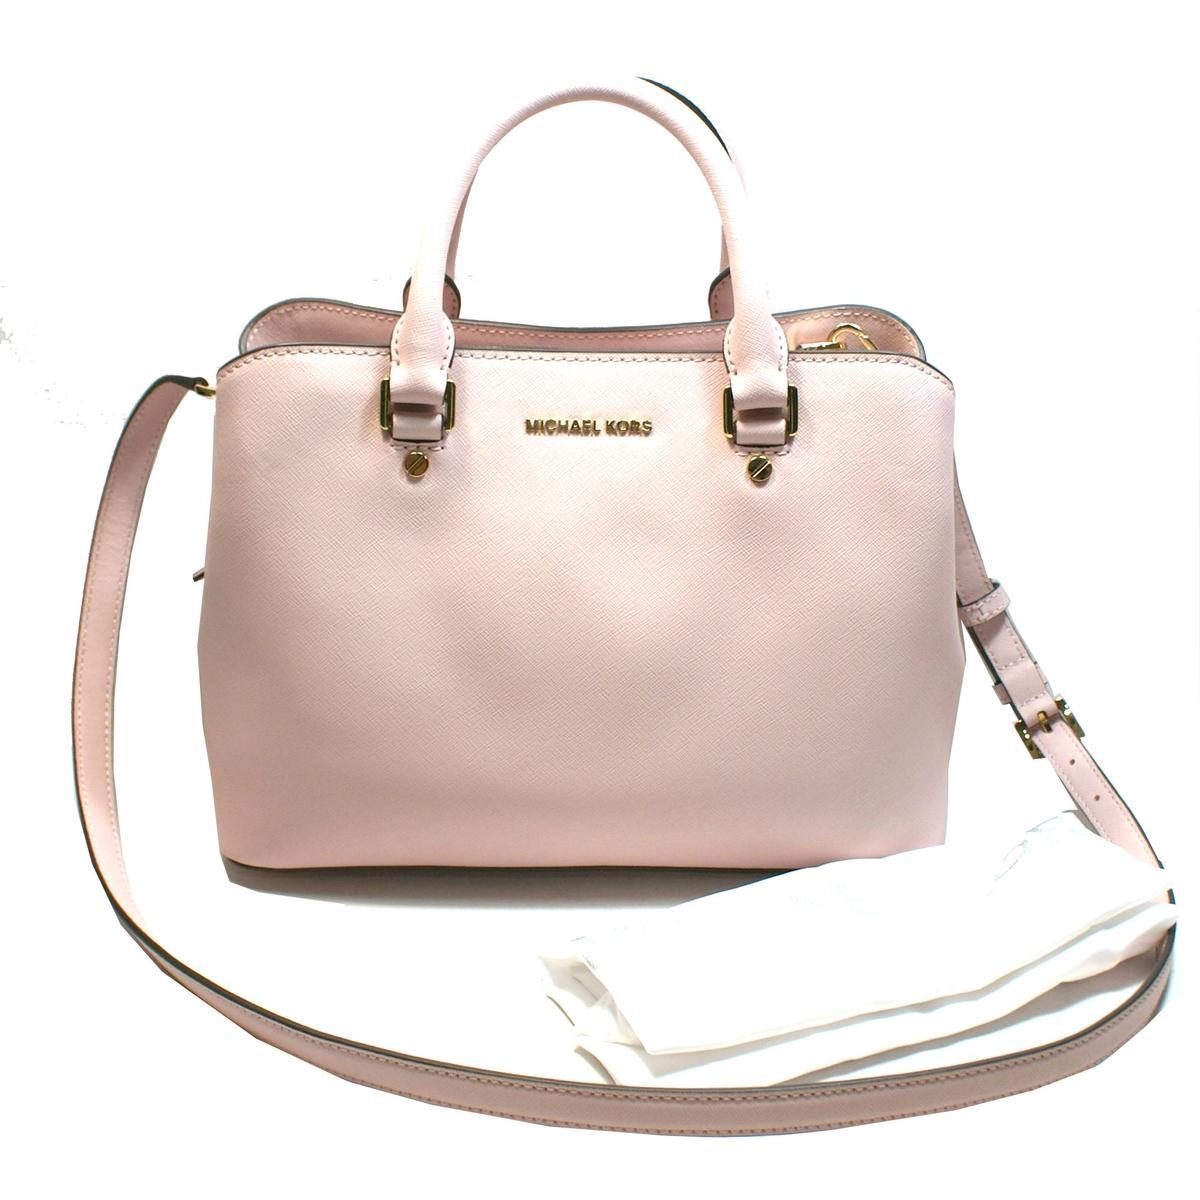 Michael Kors Savannah Medium Satchel Leather Crossbody Bag